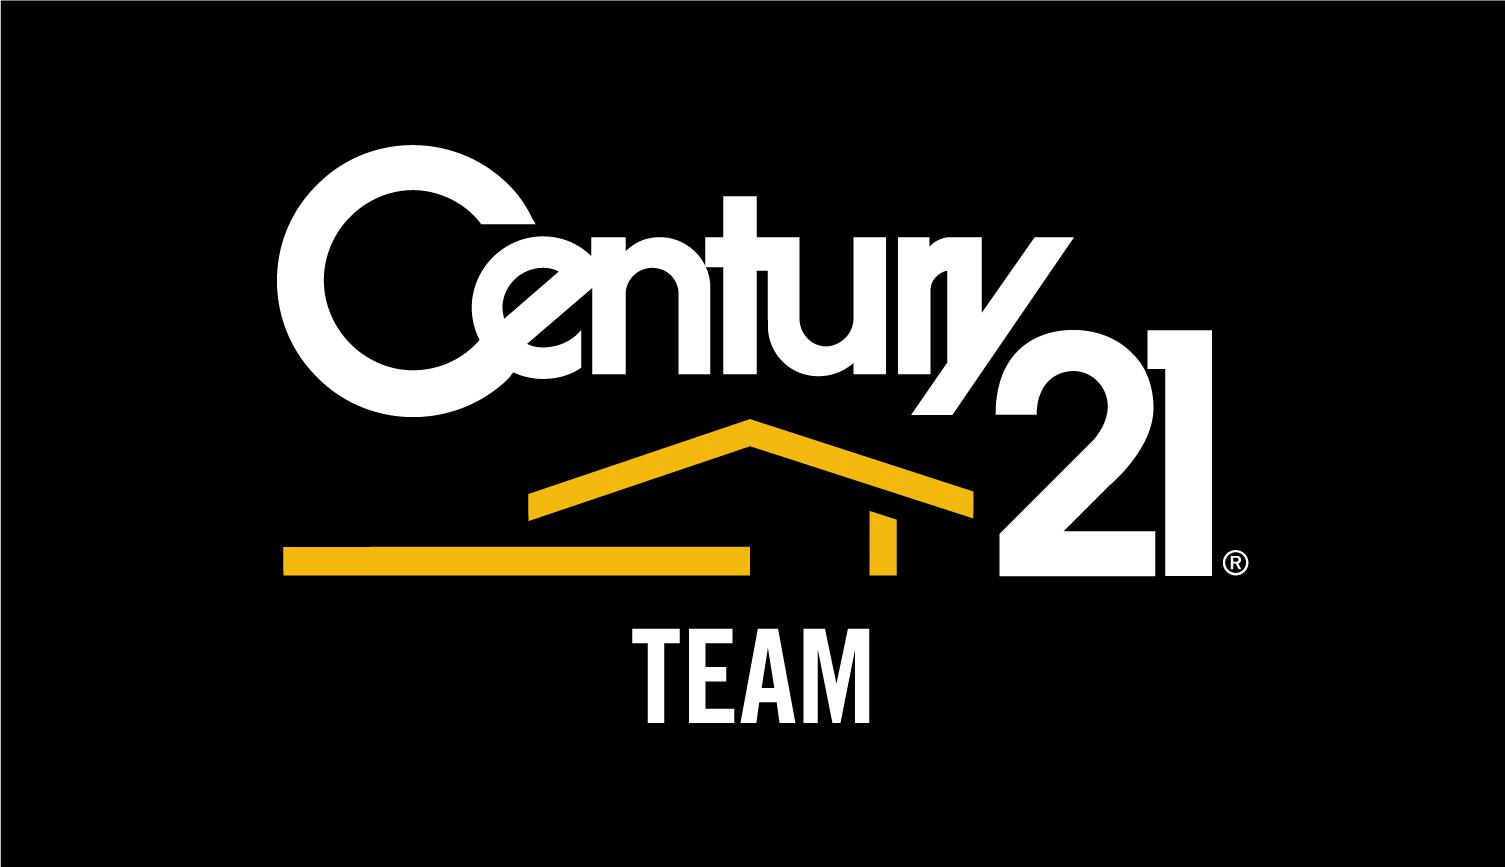 Century 21, Dandenong, 3175